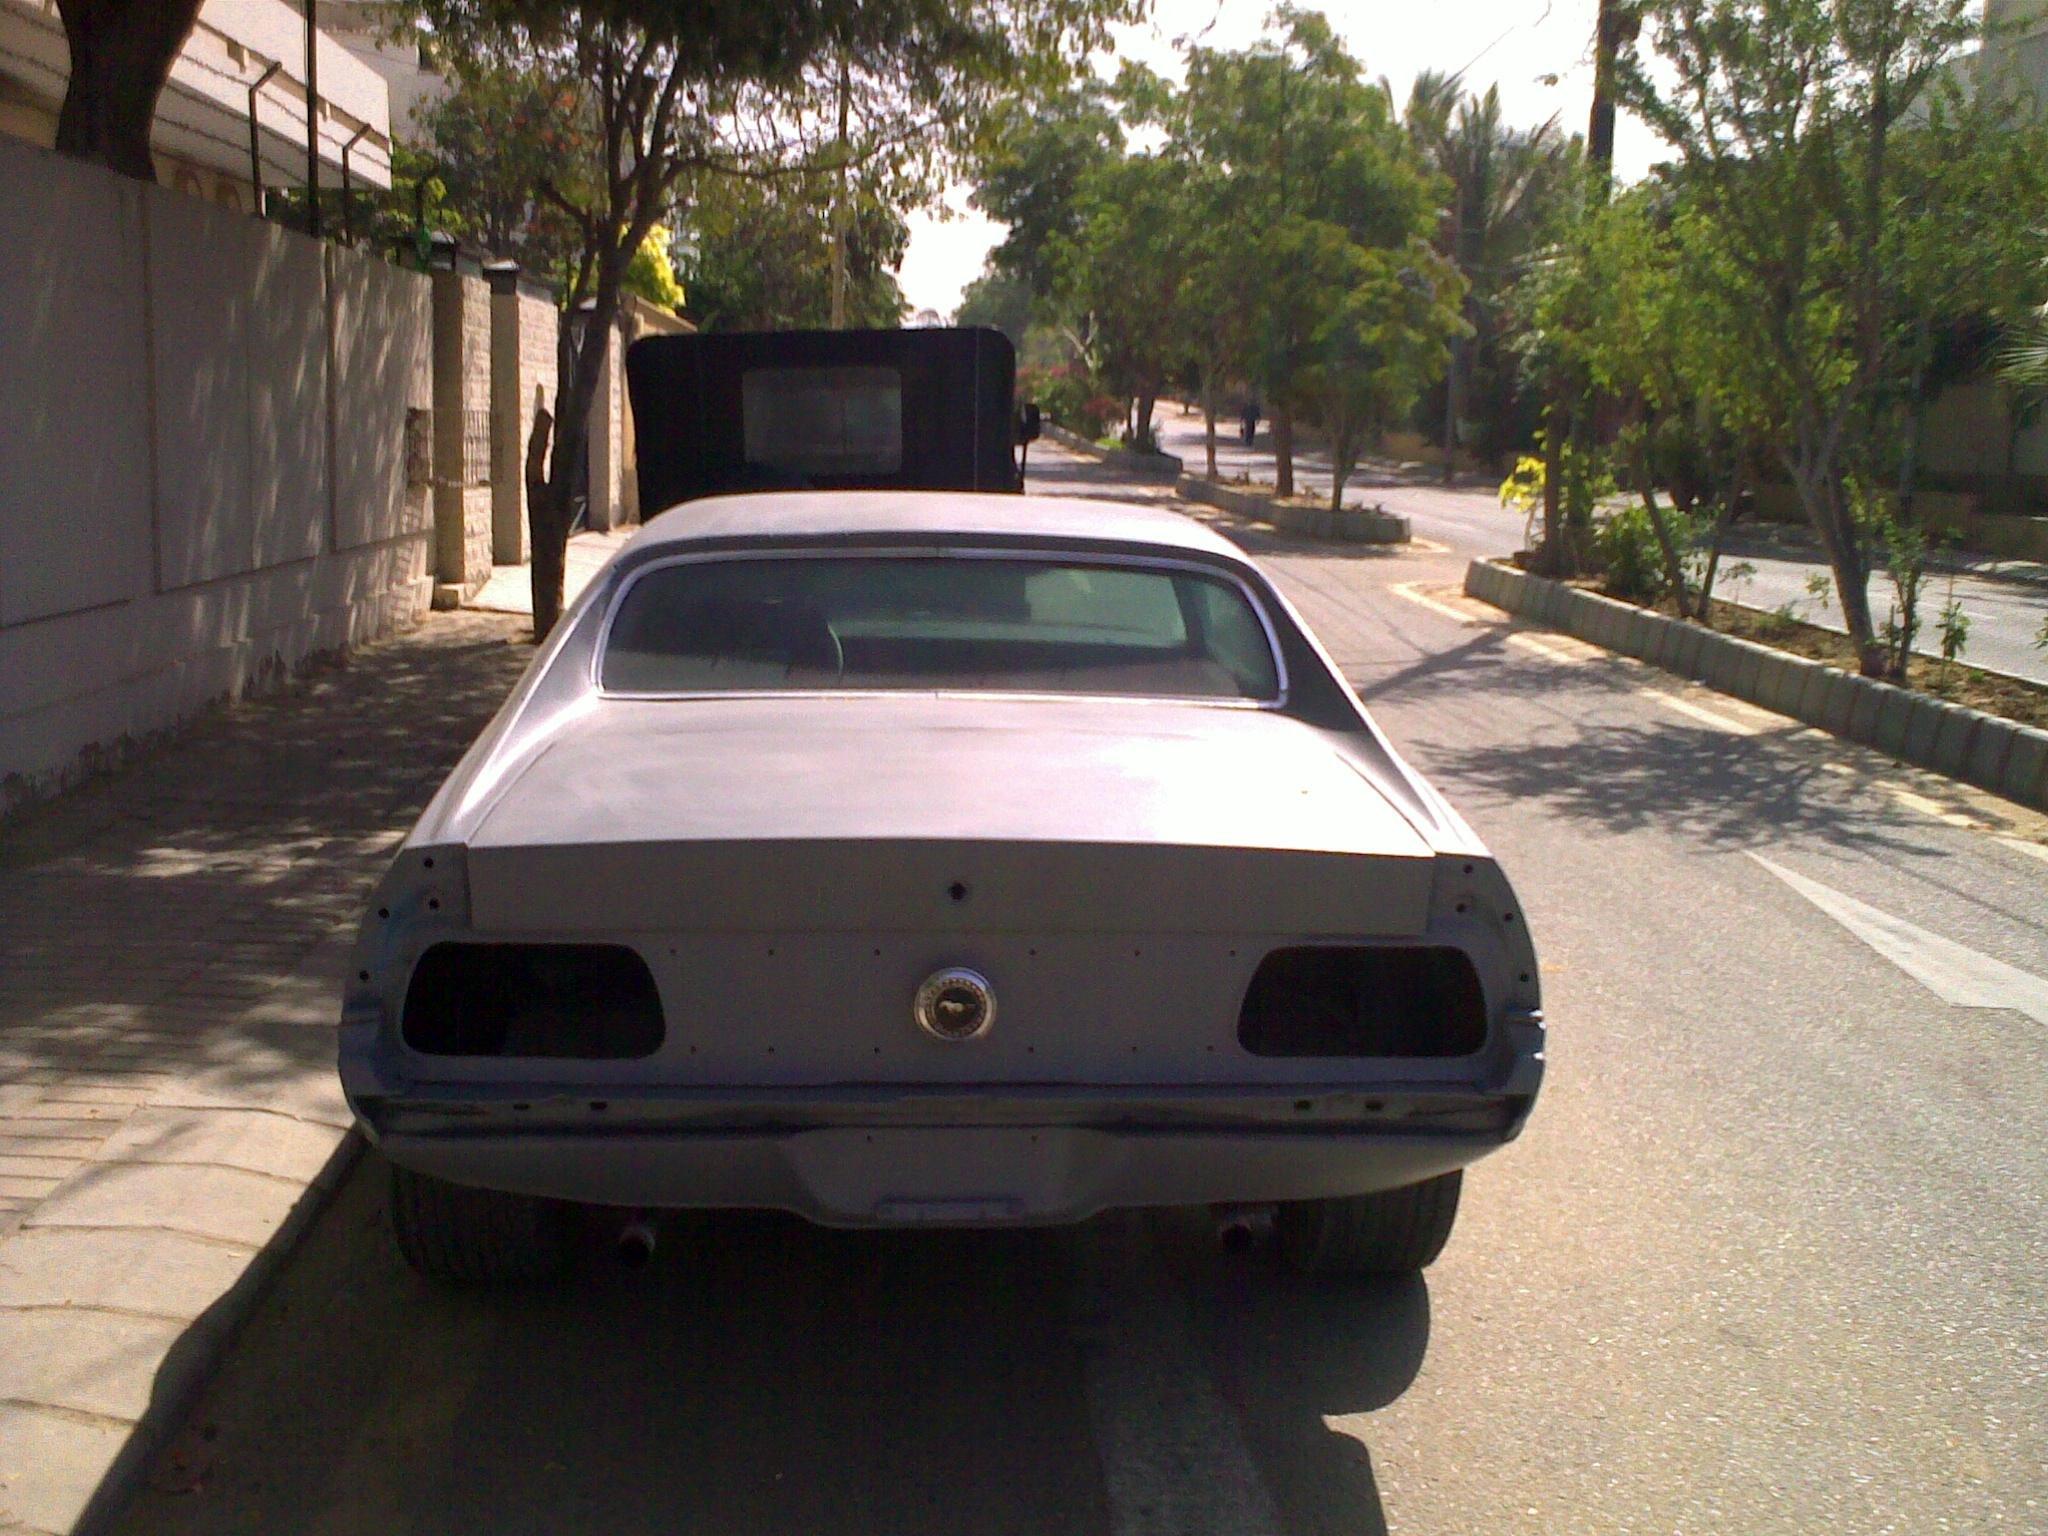 1973 Mustang Grande Coupe Restoration Help for Novice ...